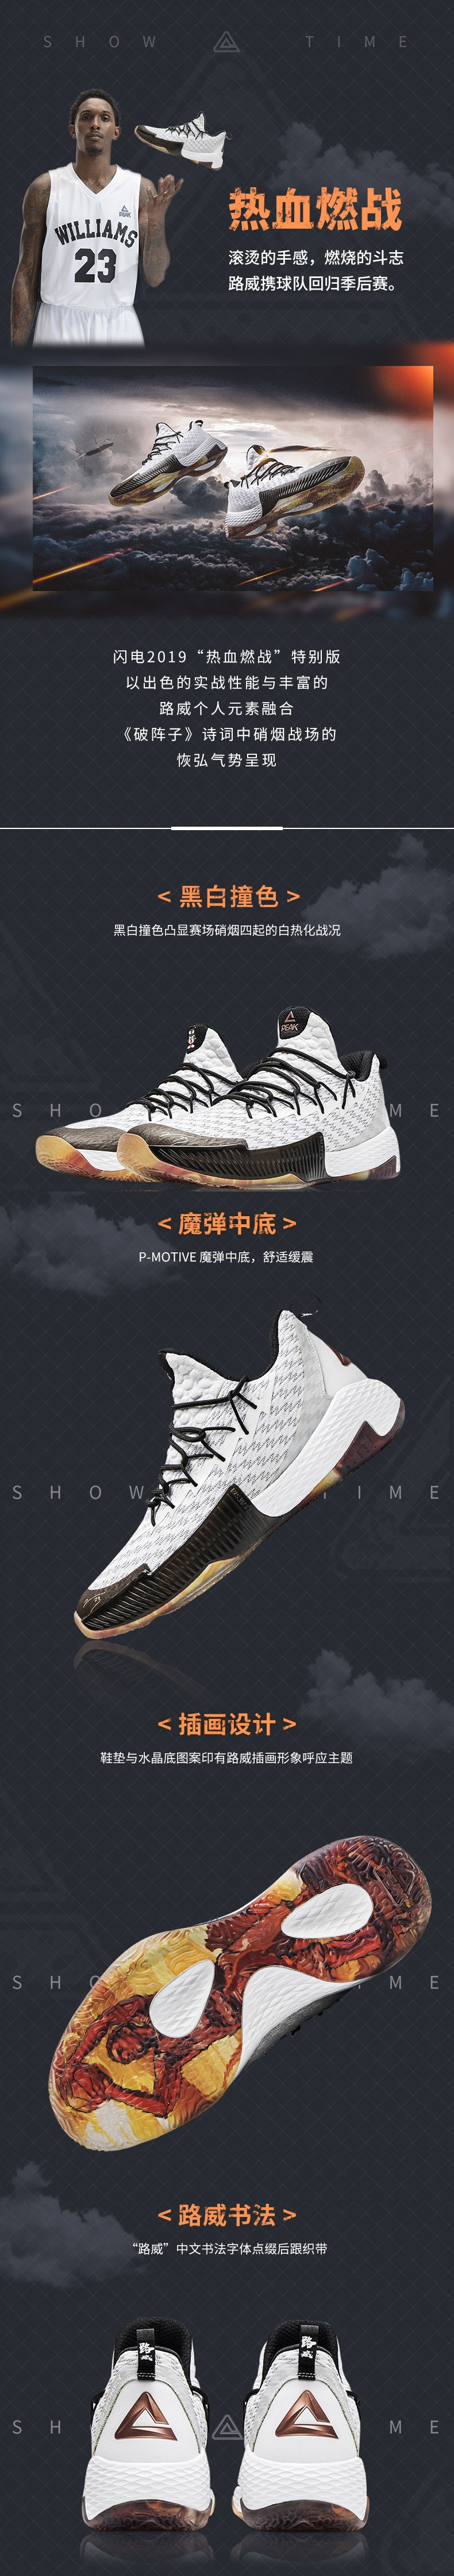 Peak Louis Williams 2019 PLAYOFFS NBA Basketball Shoes - White/Black